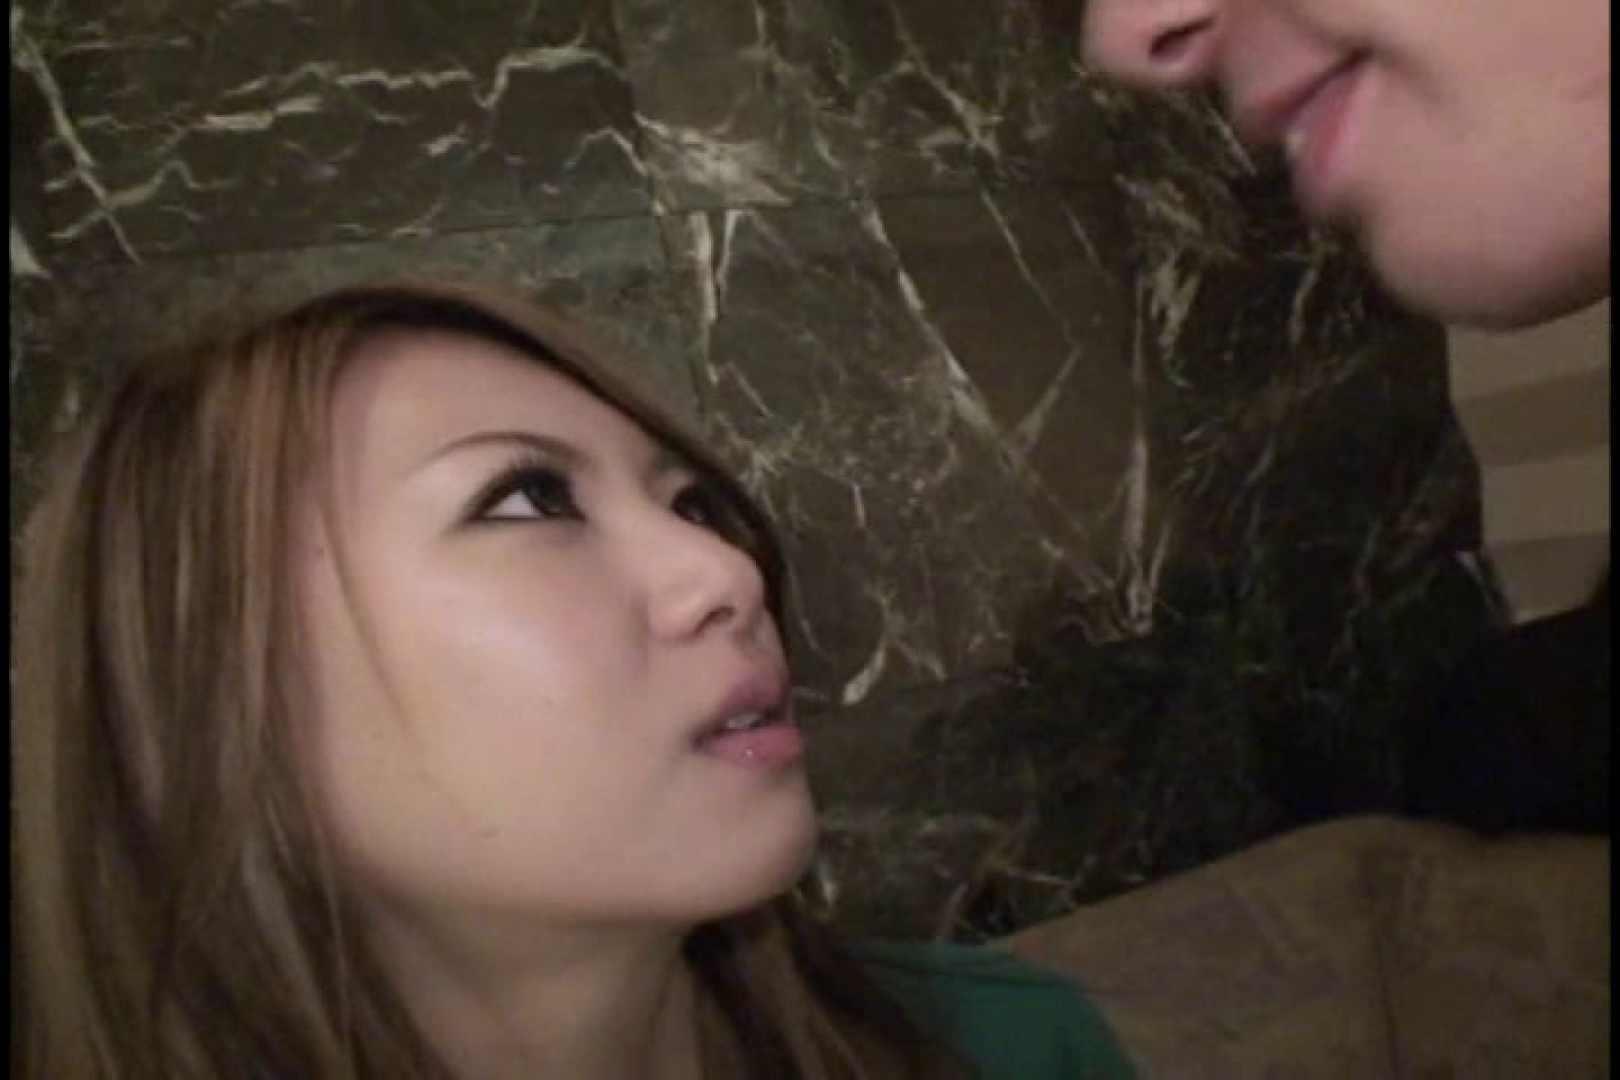 JDハンター全国ツアー vol.012 前編 女子大生のエロ動画   0  91PIX 49